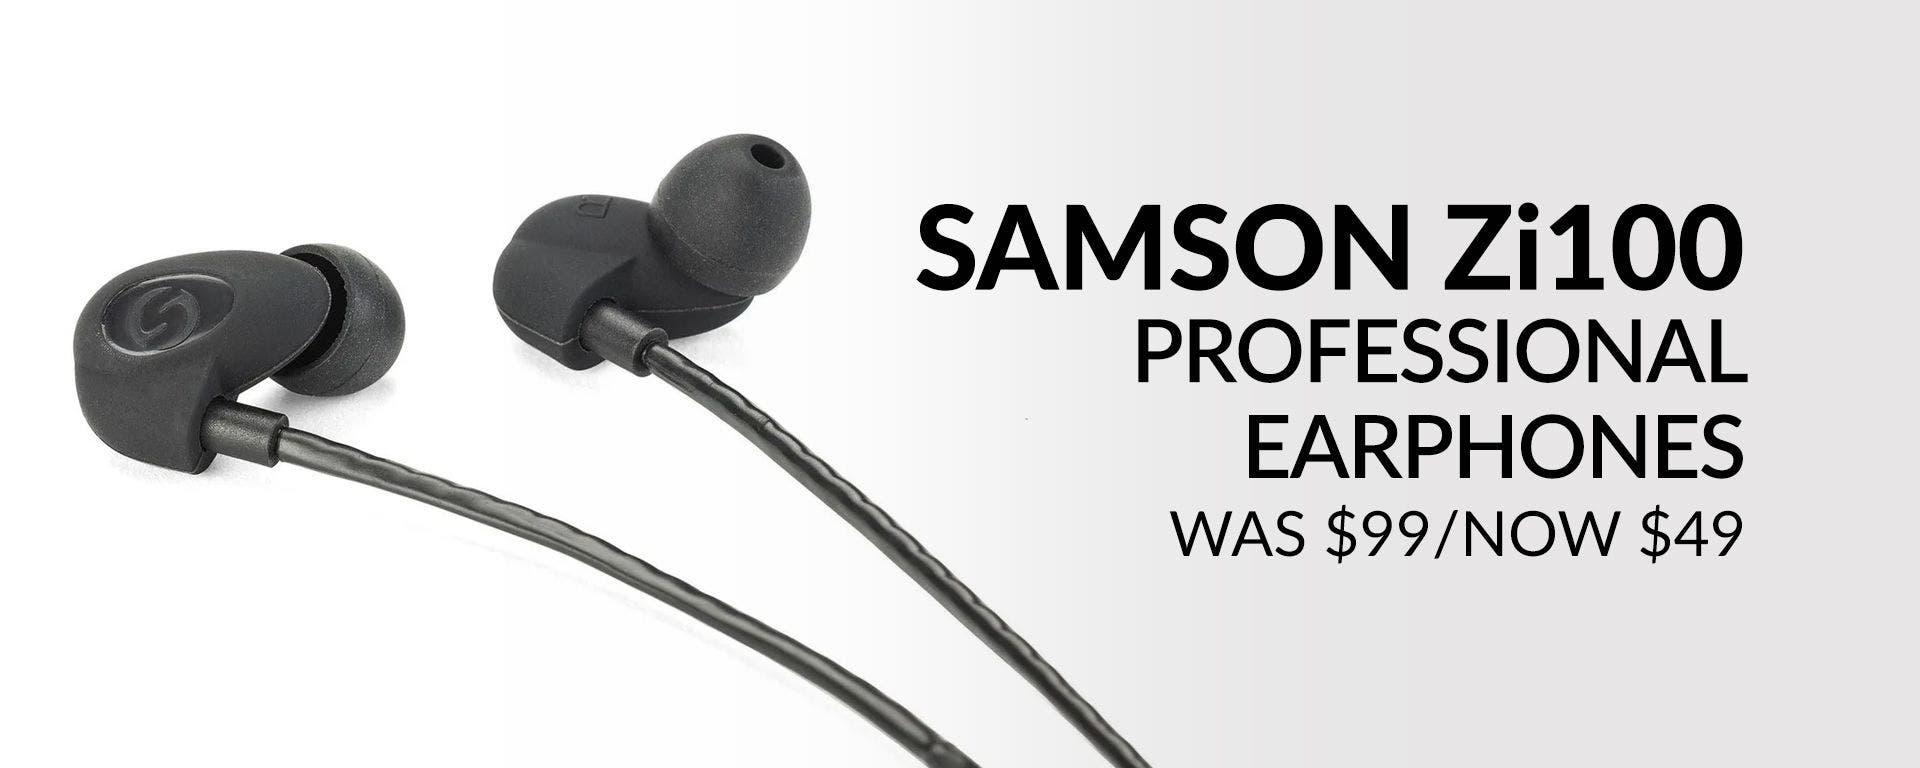 Samson Zi100 Headphone Deals at Sam Ash